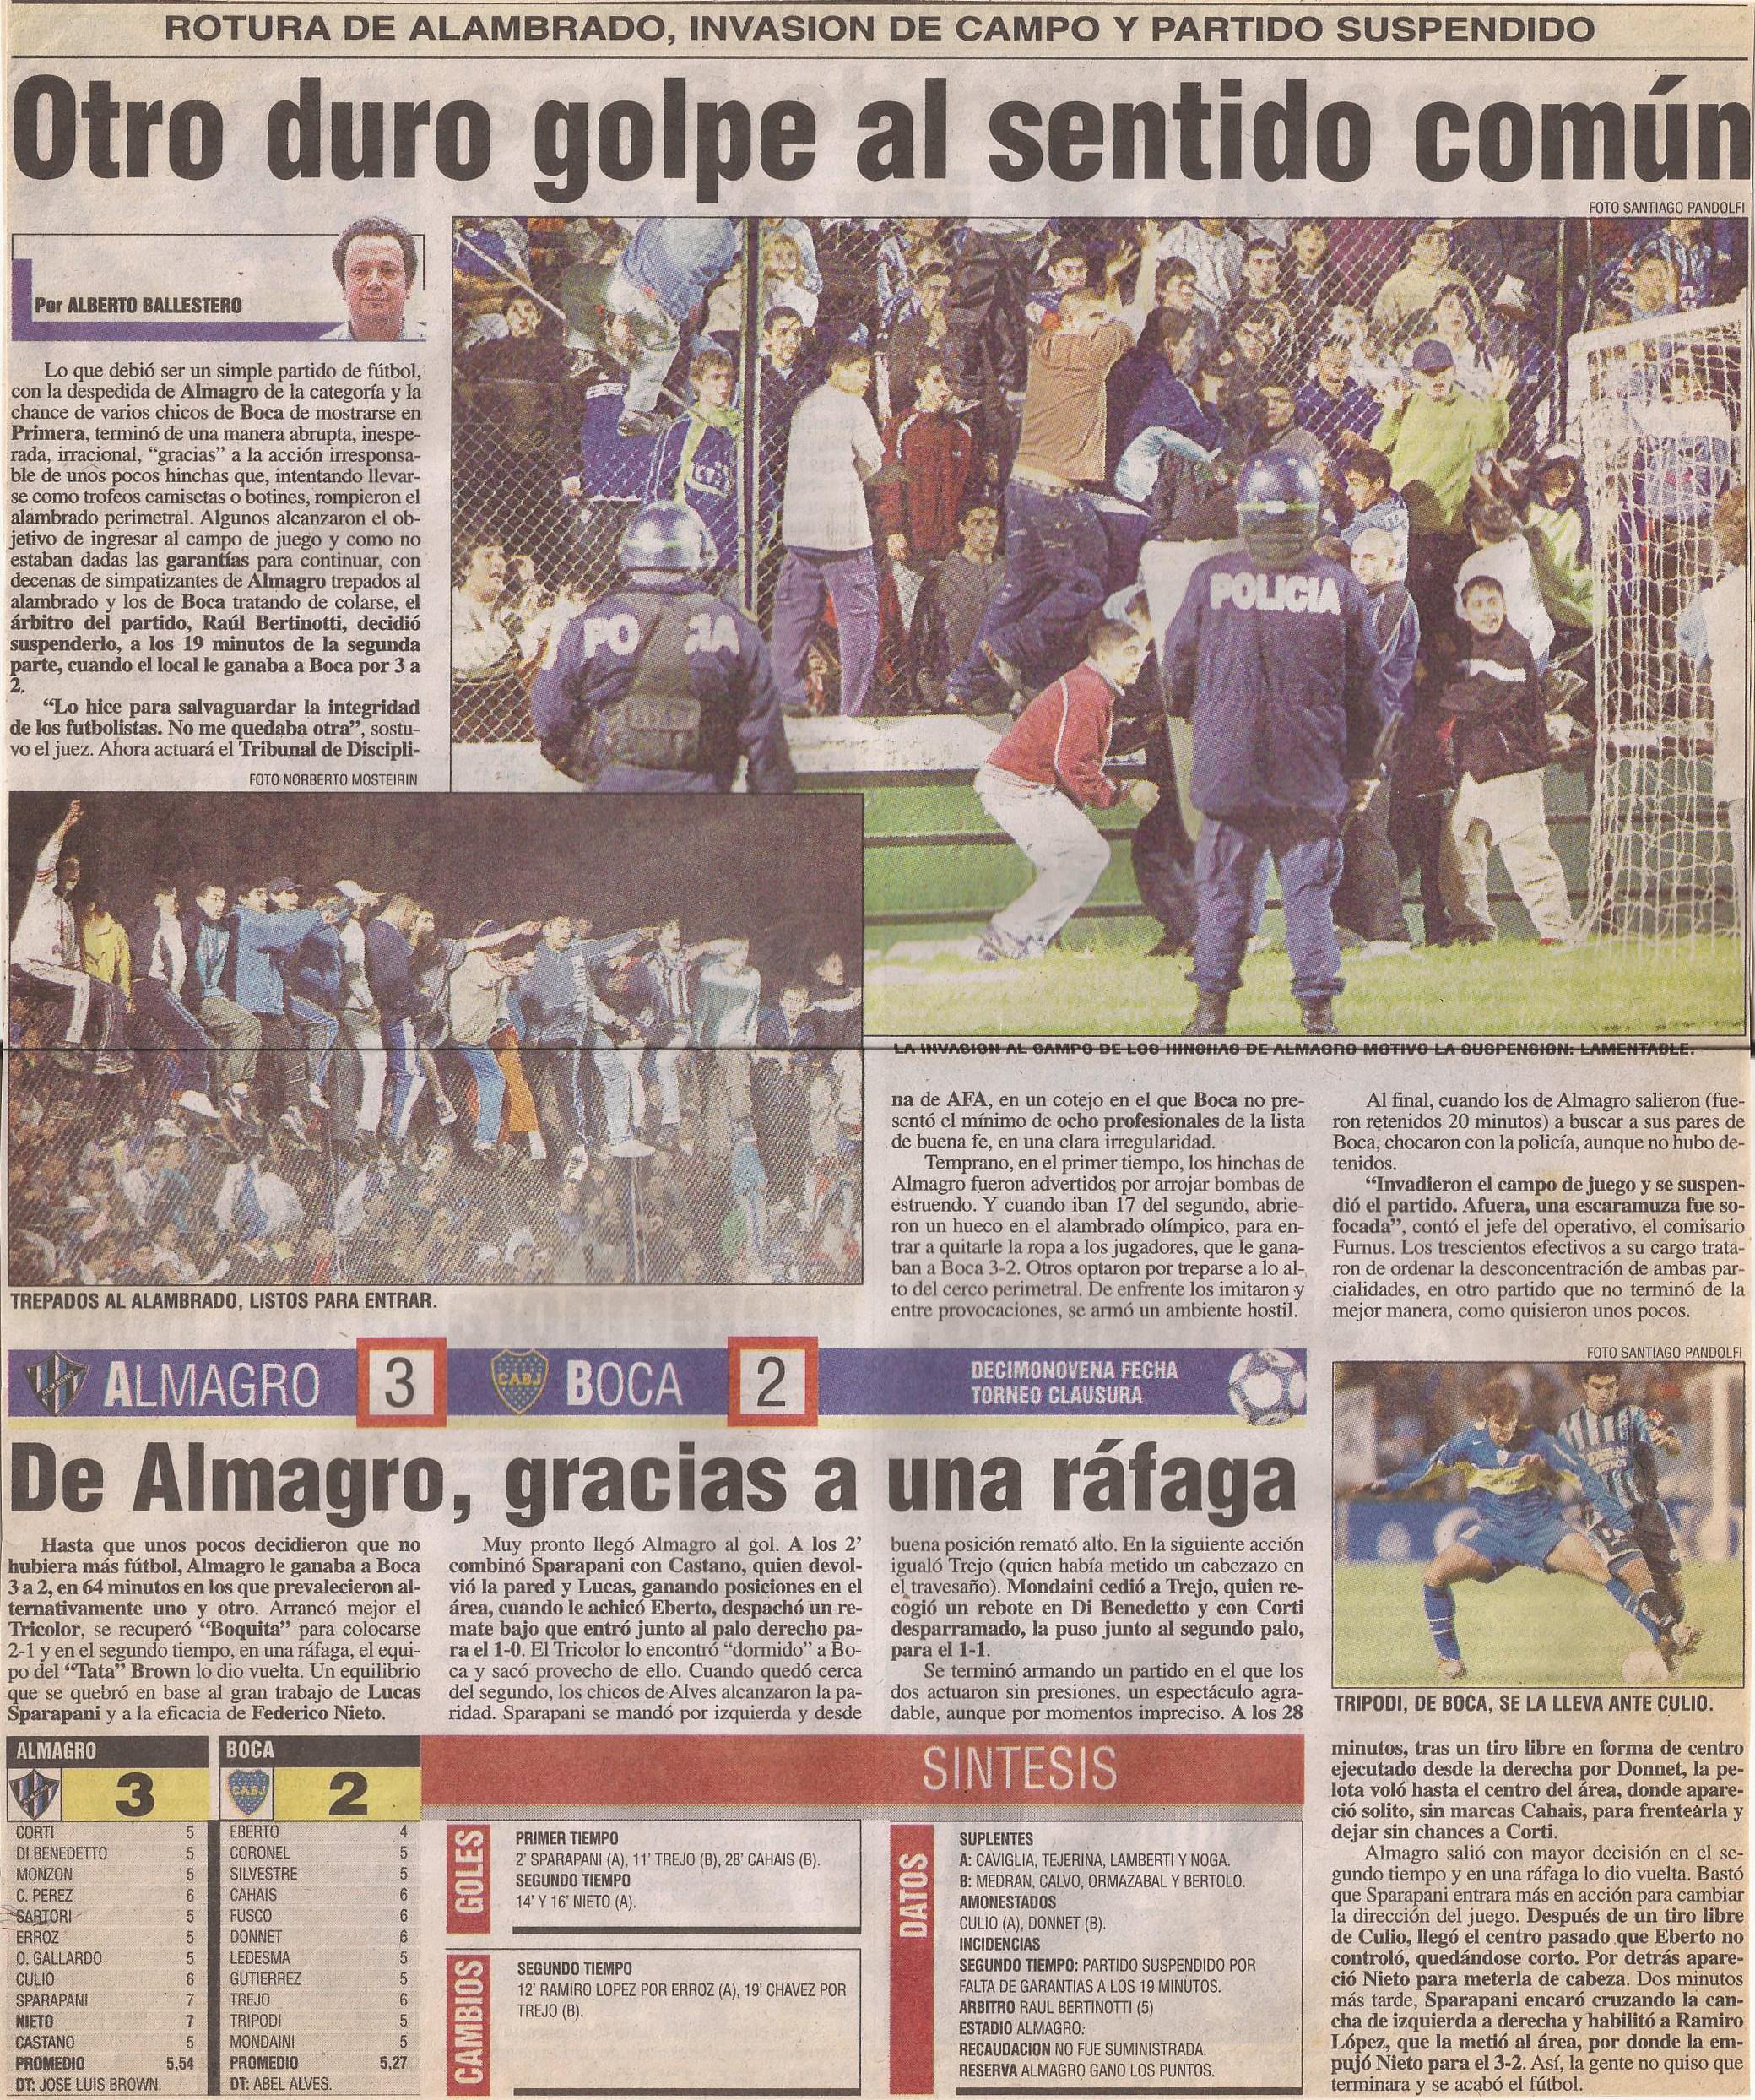 2004-05 Primera Division - Almagro vs Boca - Diario Popular